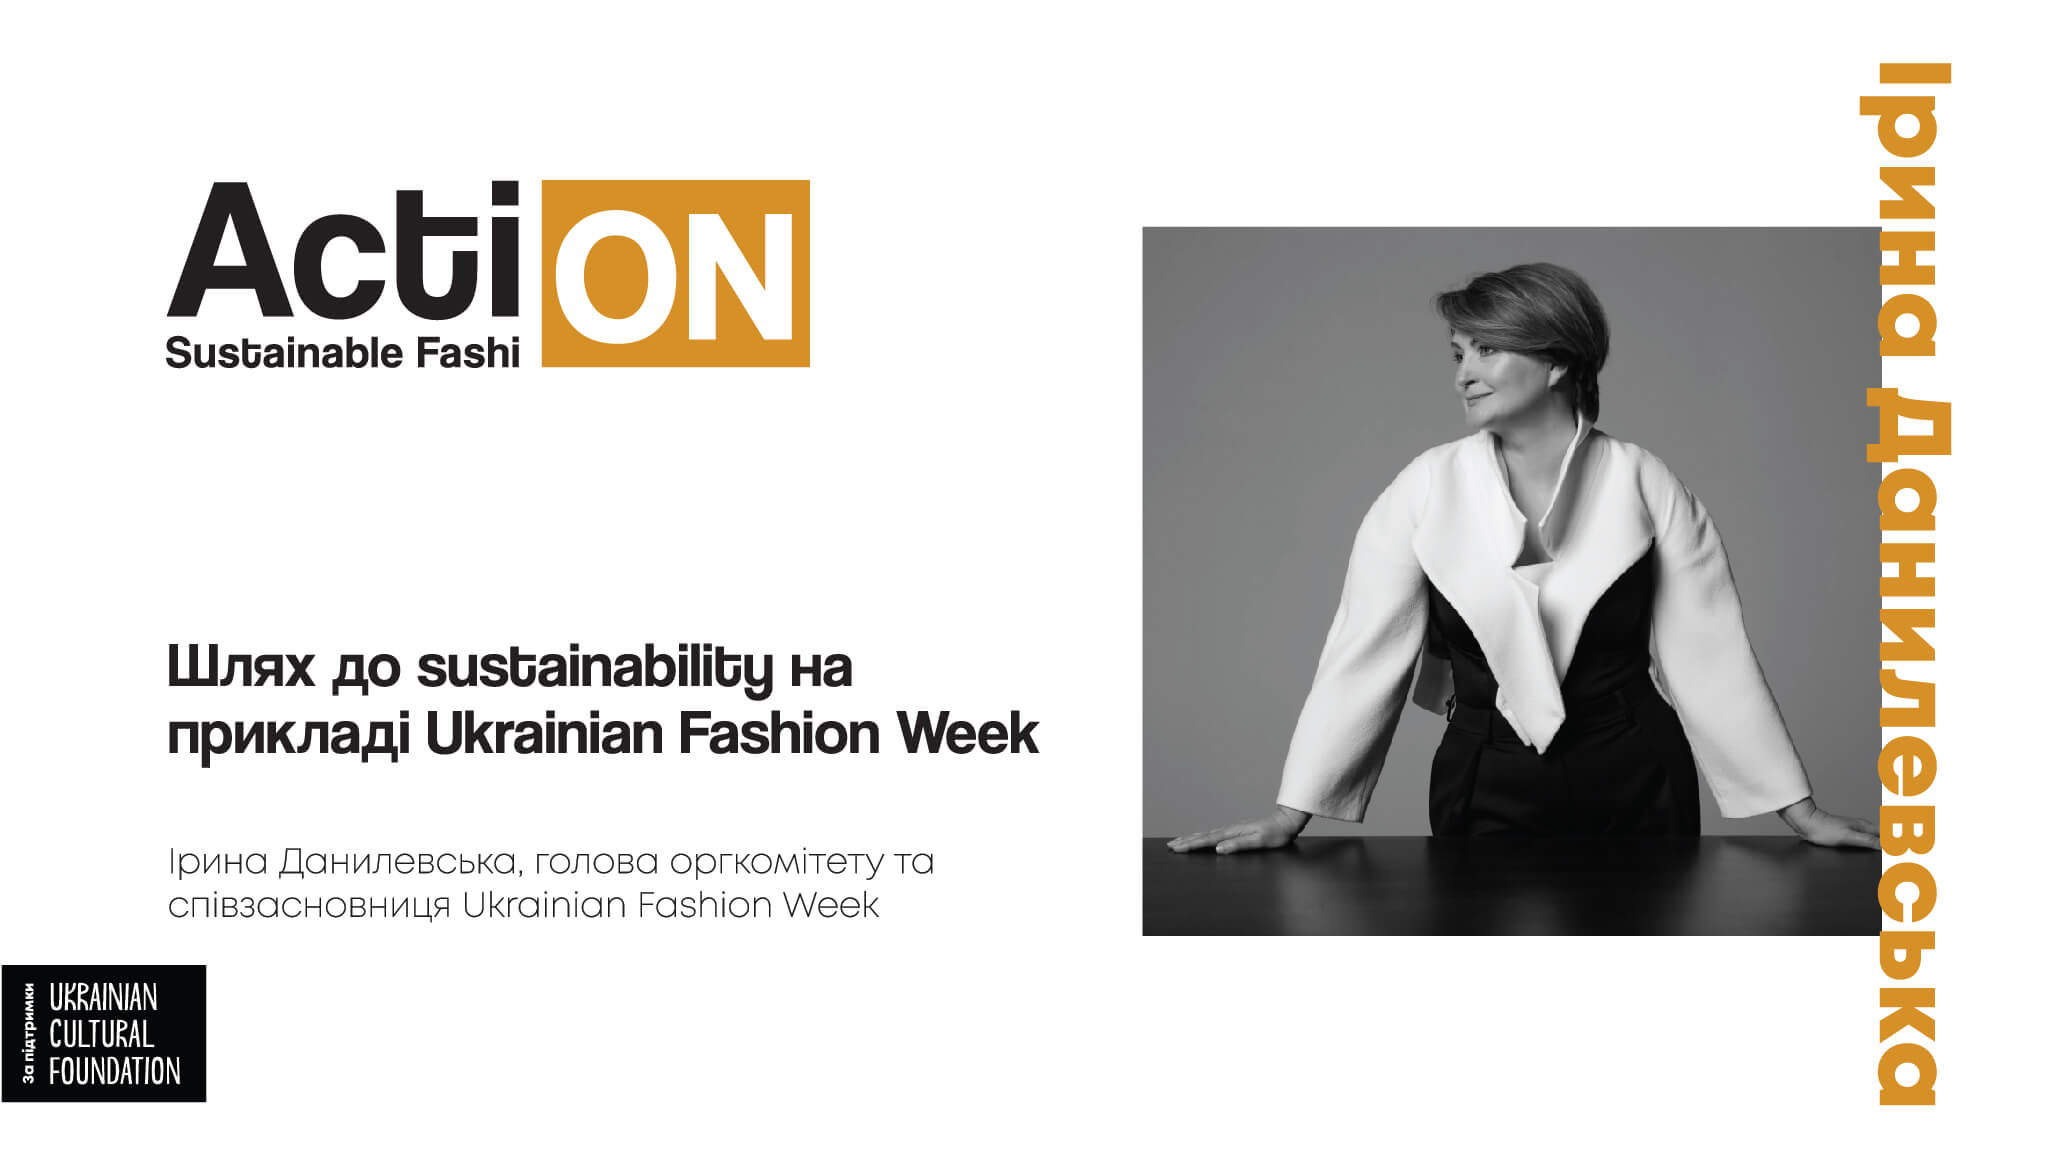 Action: Sustainable Fashion: Освітня Програма-Фото 6